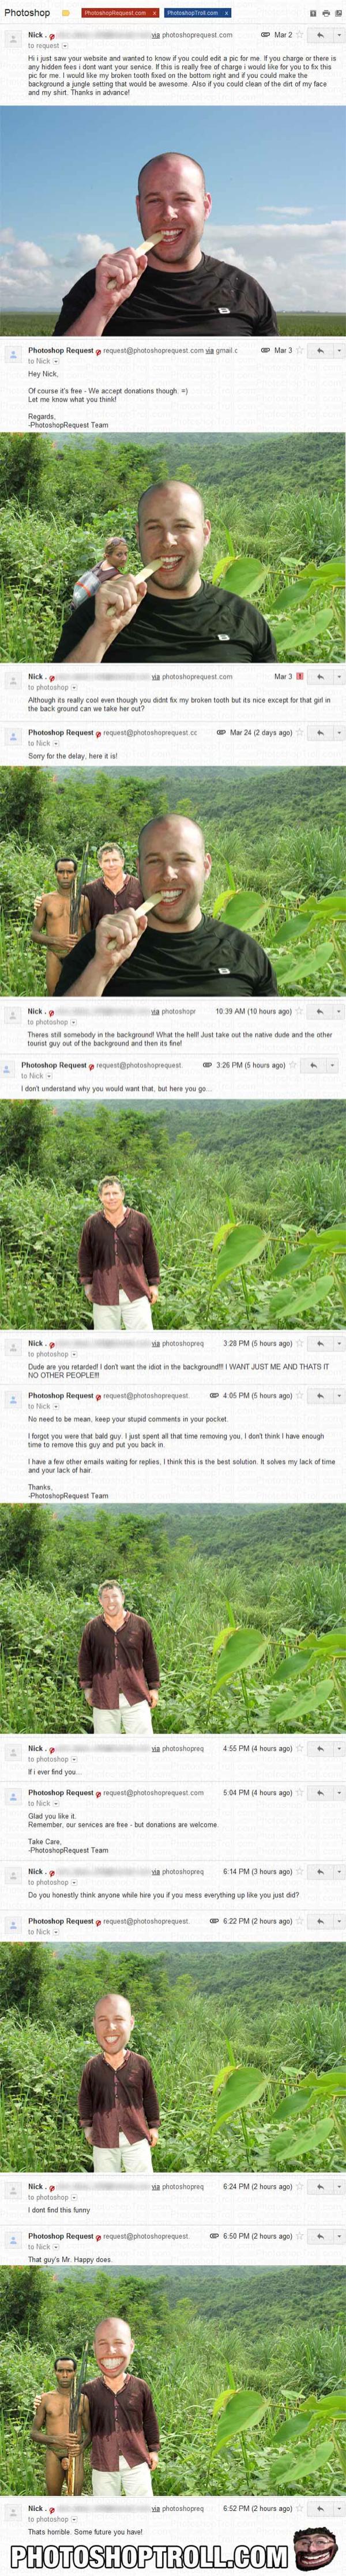 Photoshop Troll jungle